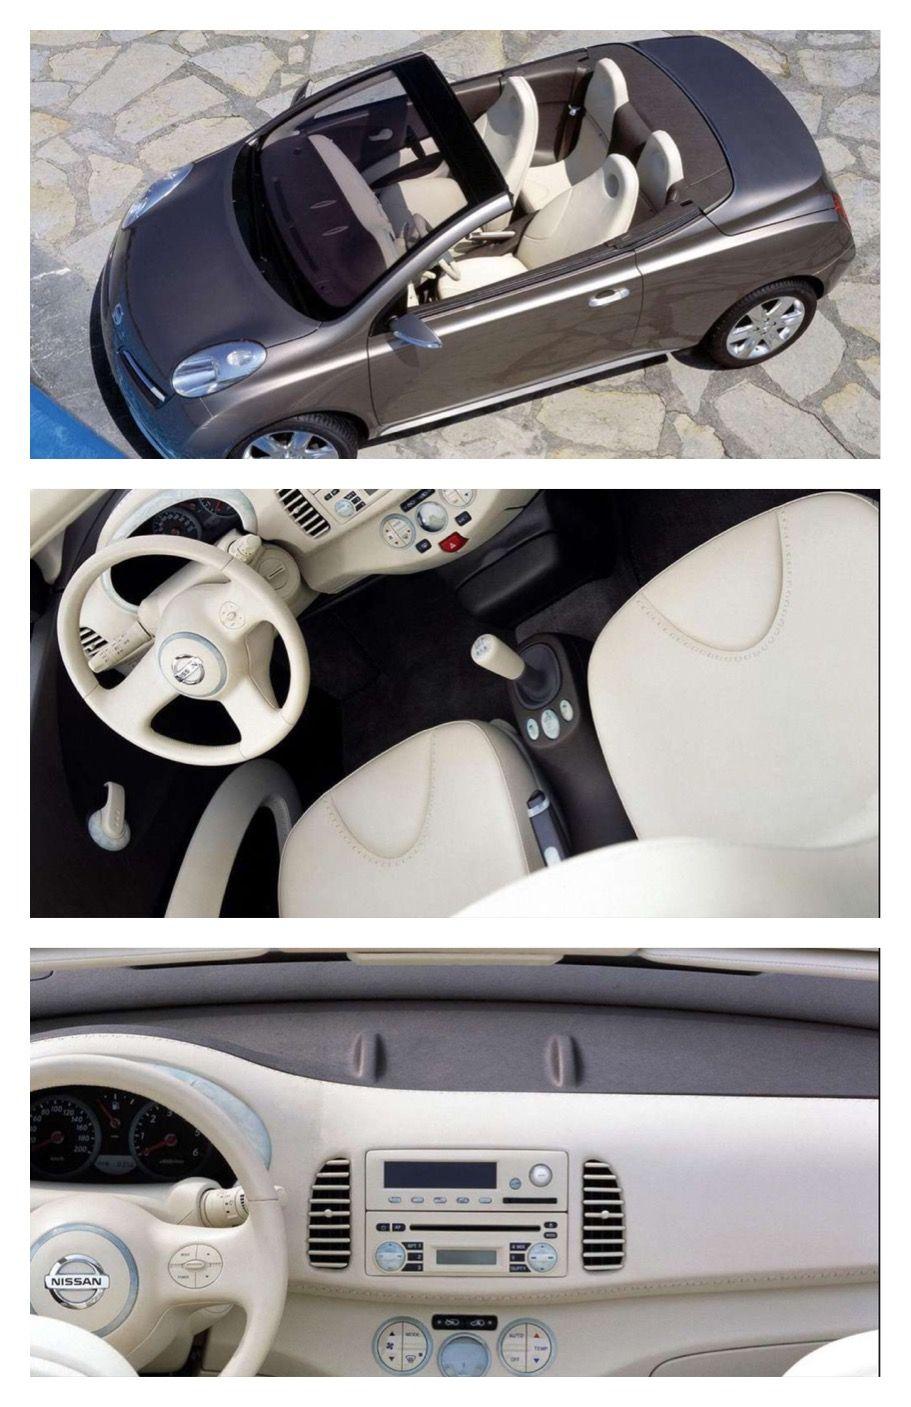 Nissan micra cc nissan datsun pinterest nissan nissan nissan micra cc vanachro Choice Image